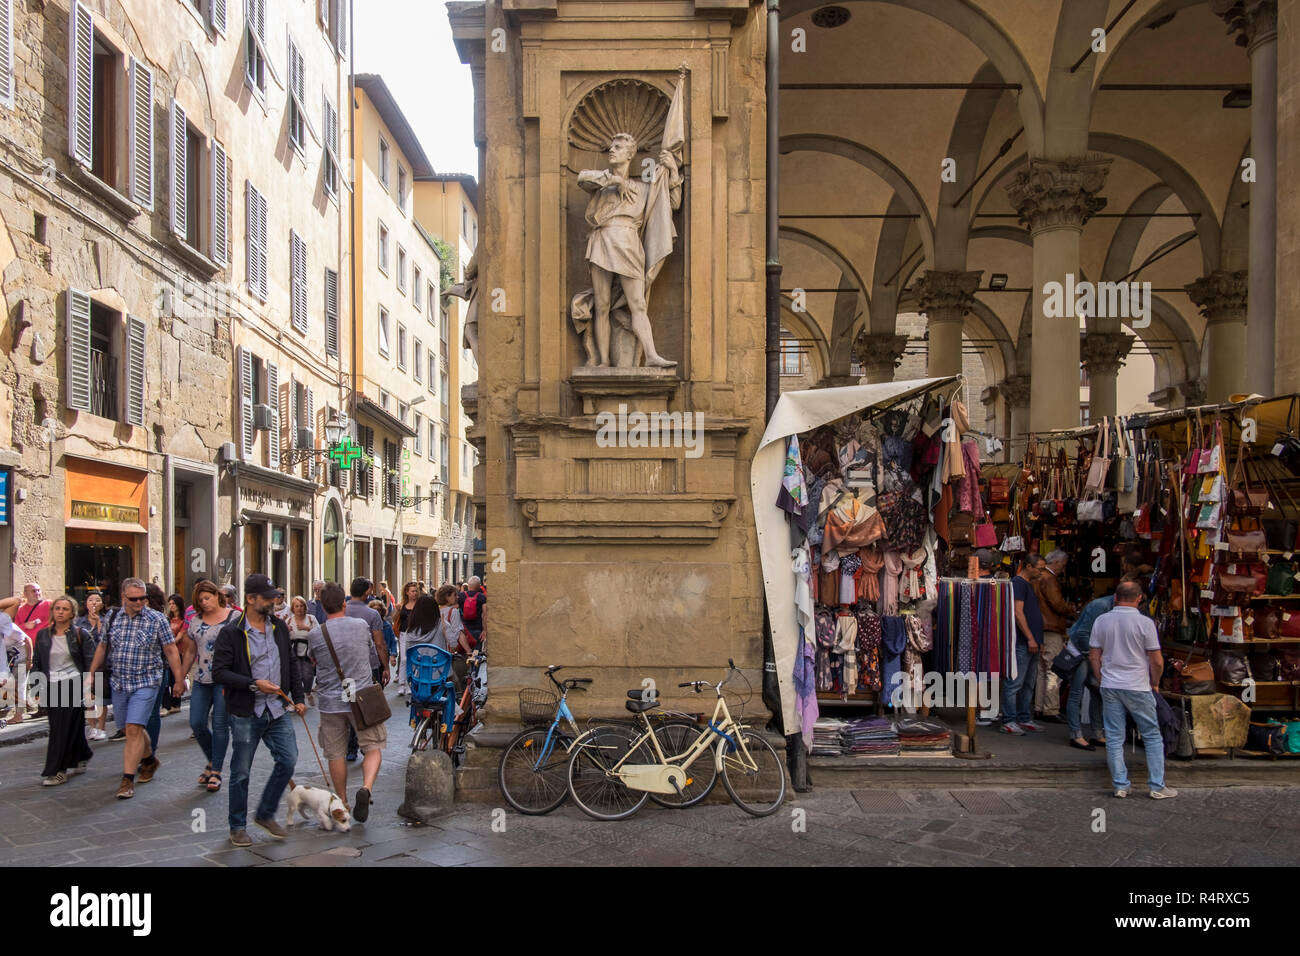 Mercato Nuovo, or the Mercato del Porcellino, Florence, Italy. - Stock Image